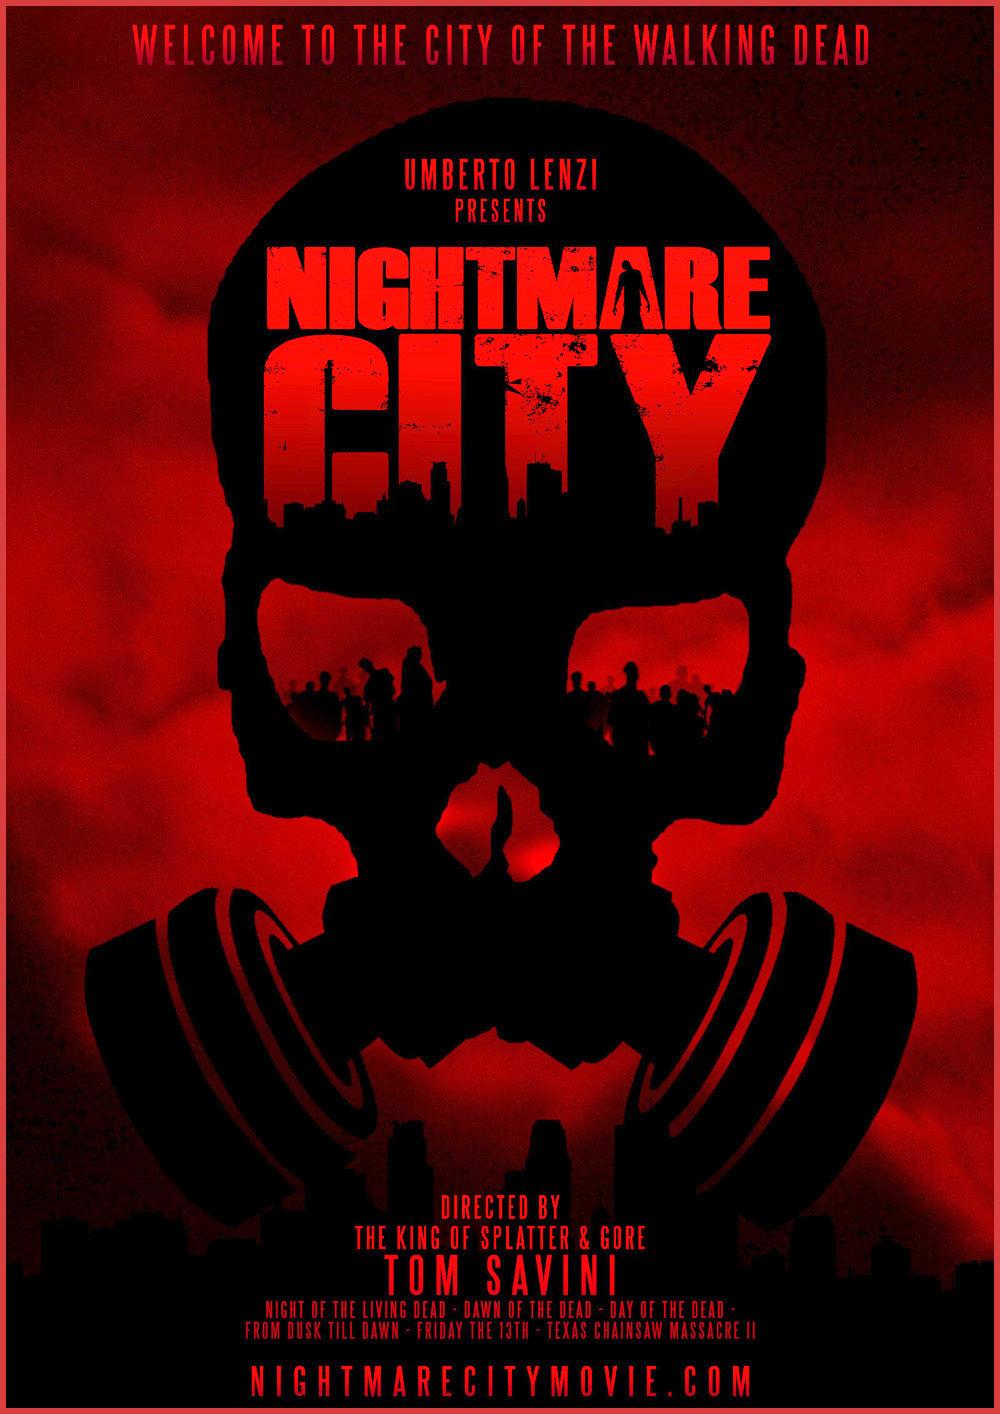 NIGHTMARE CITY REMAKE MOVIE POSTER COURTESY OF NIGHTMARECITYMOVIE.COM